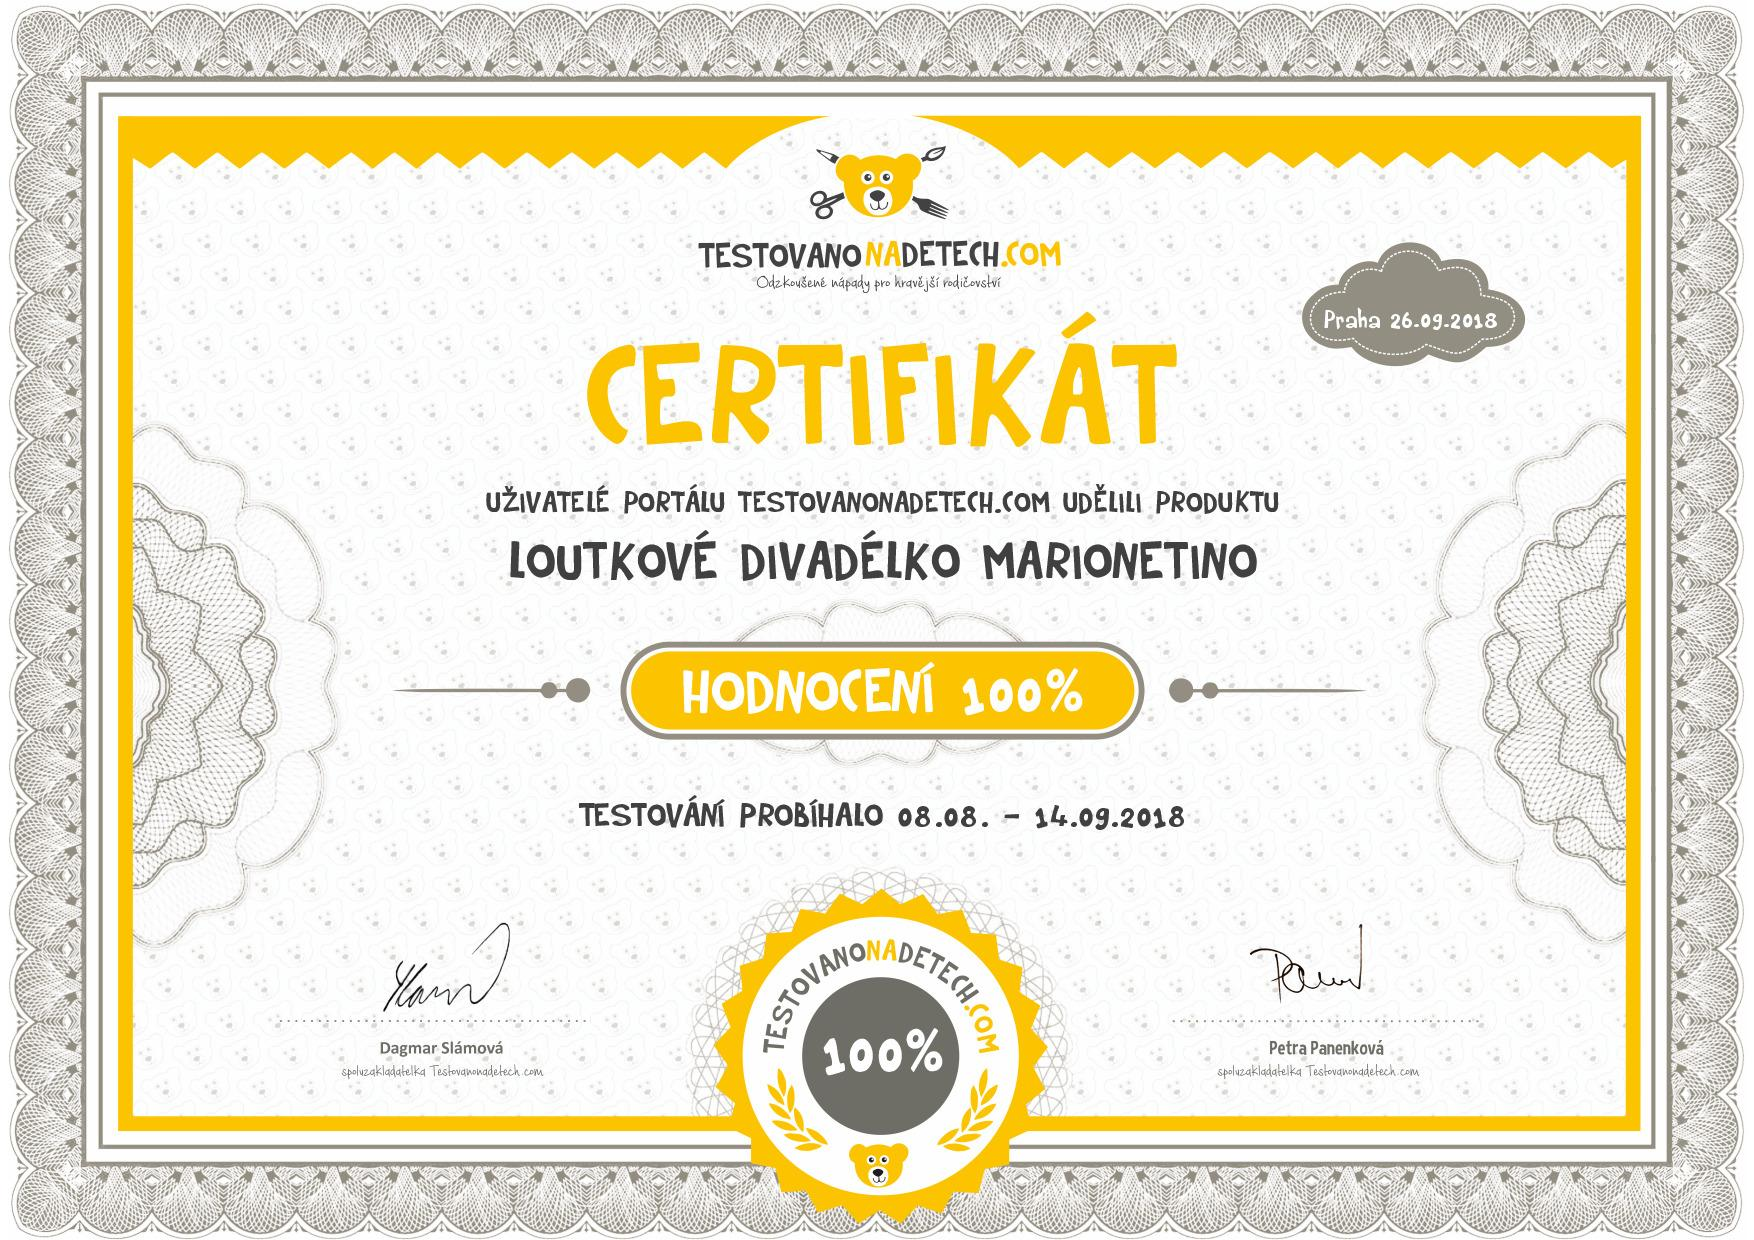 Certifikat_divadlo